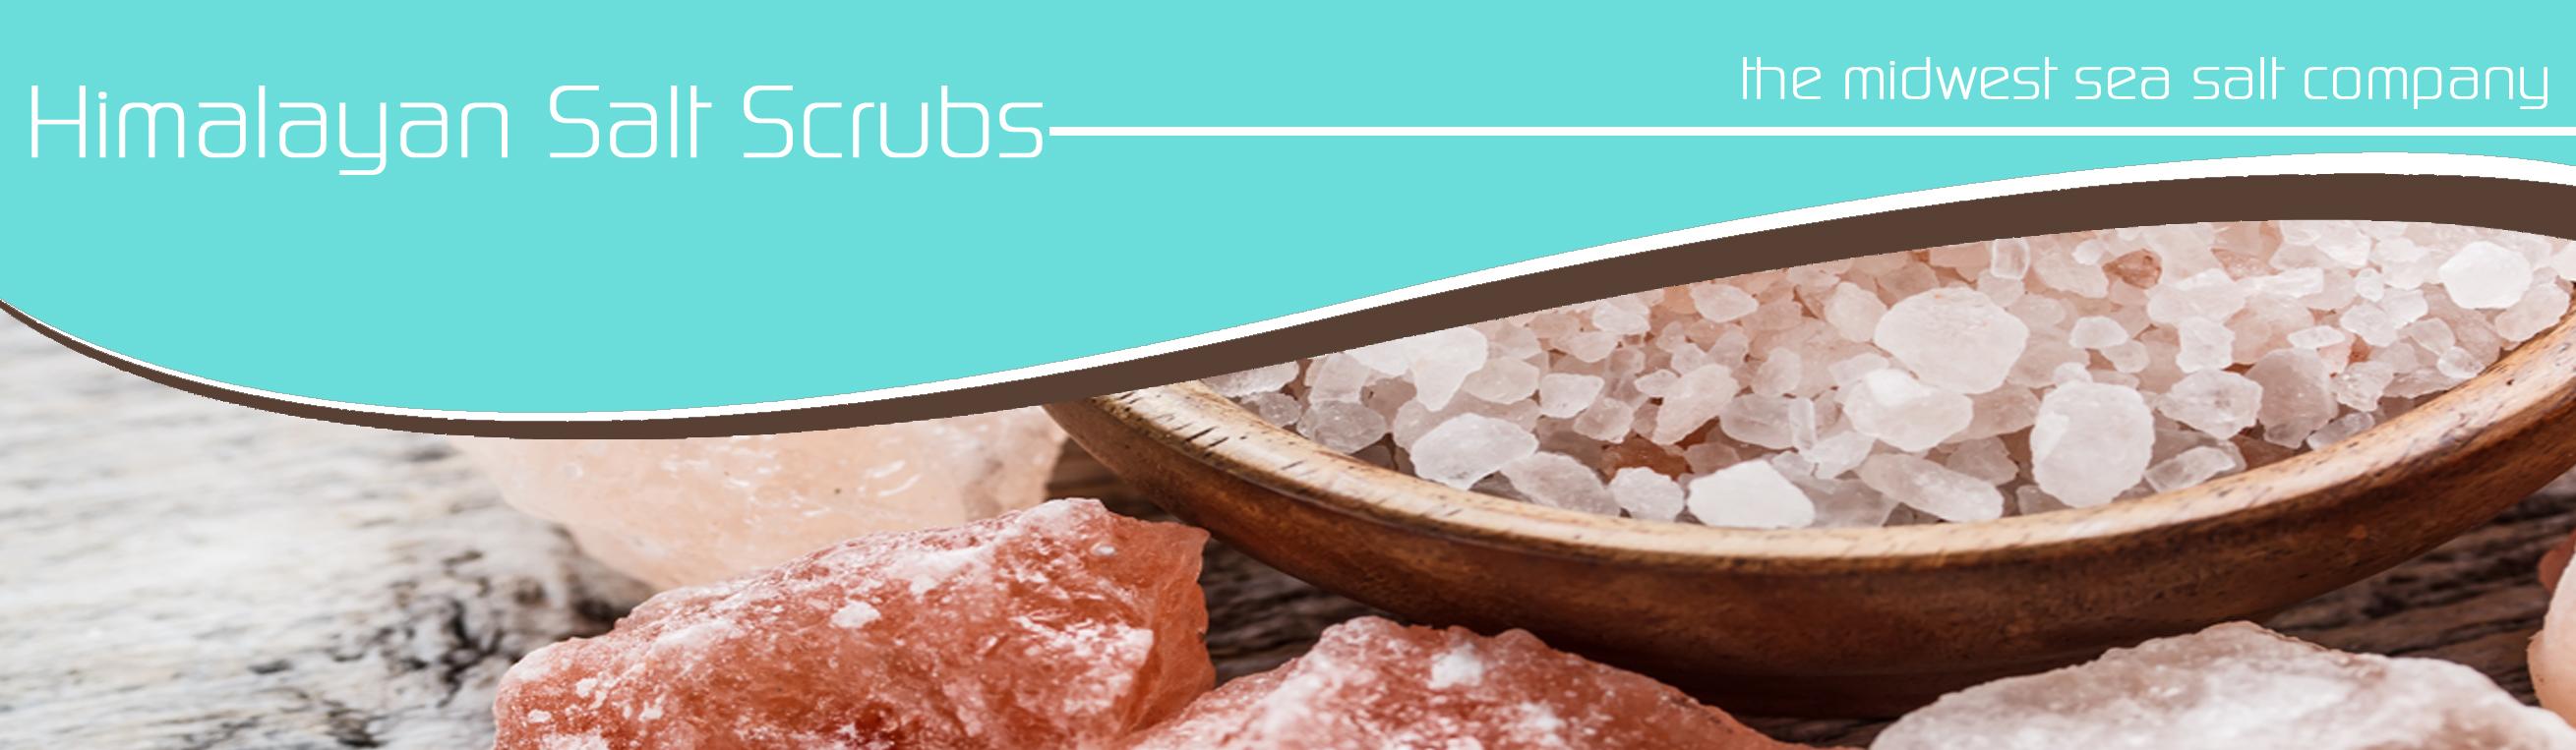 himalayan-salt-scrubs-midwest-sea-salt.jpg